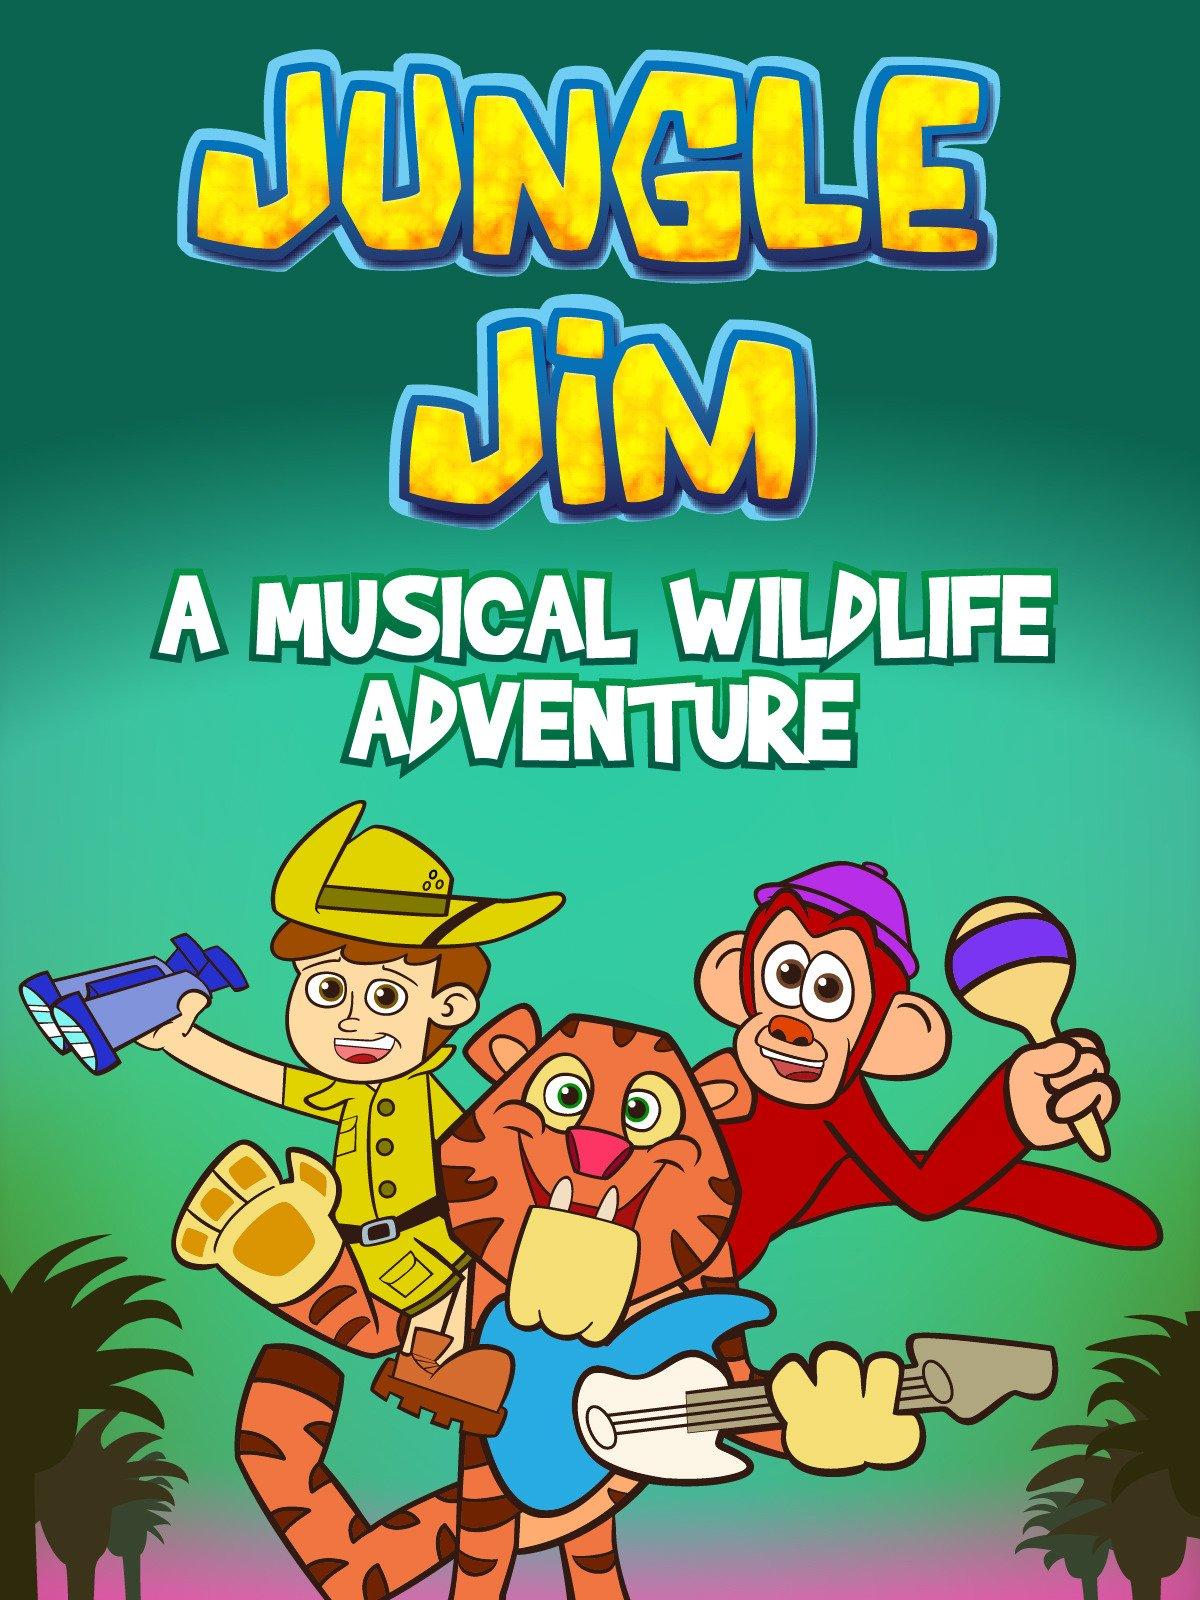 Jungle Jim Musical Wildlife Adventure